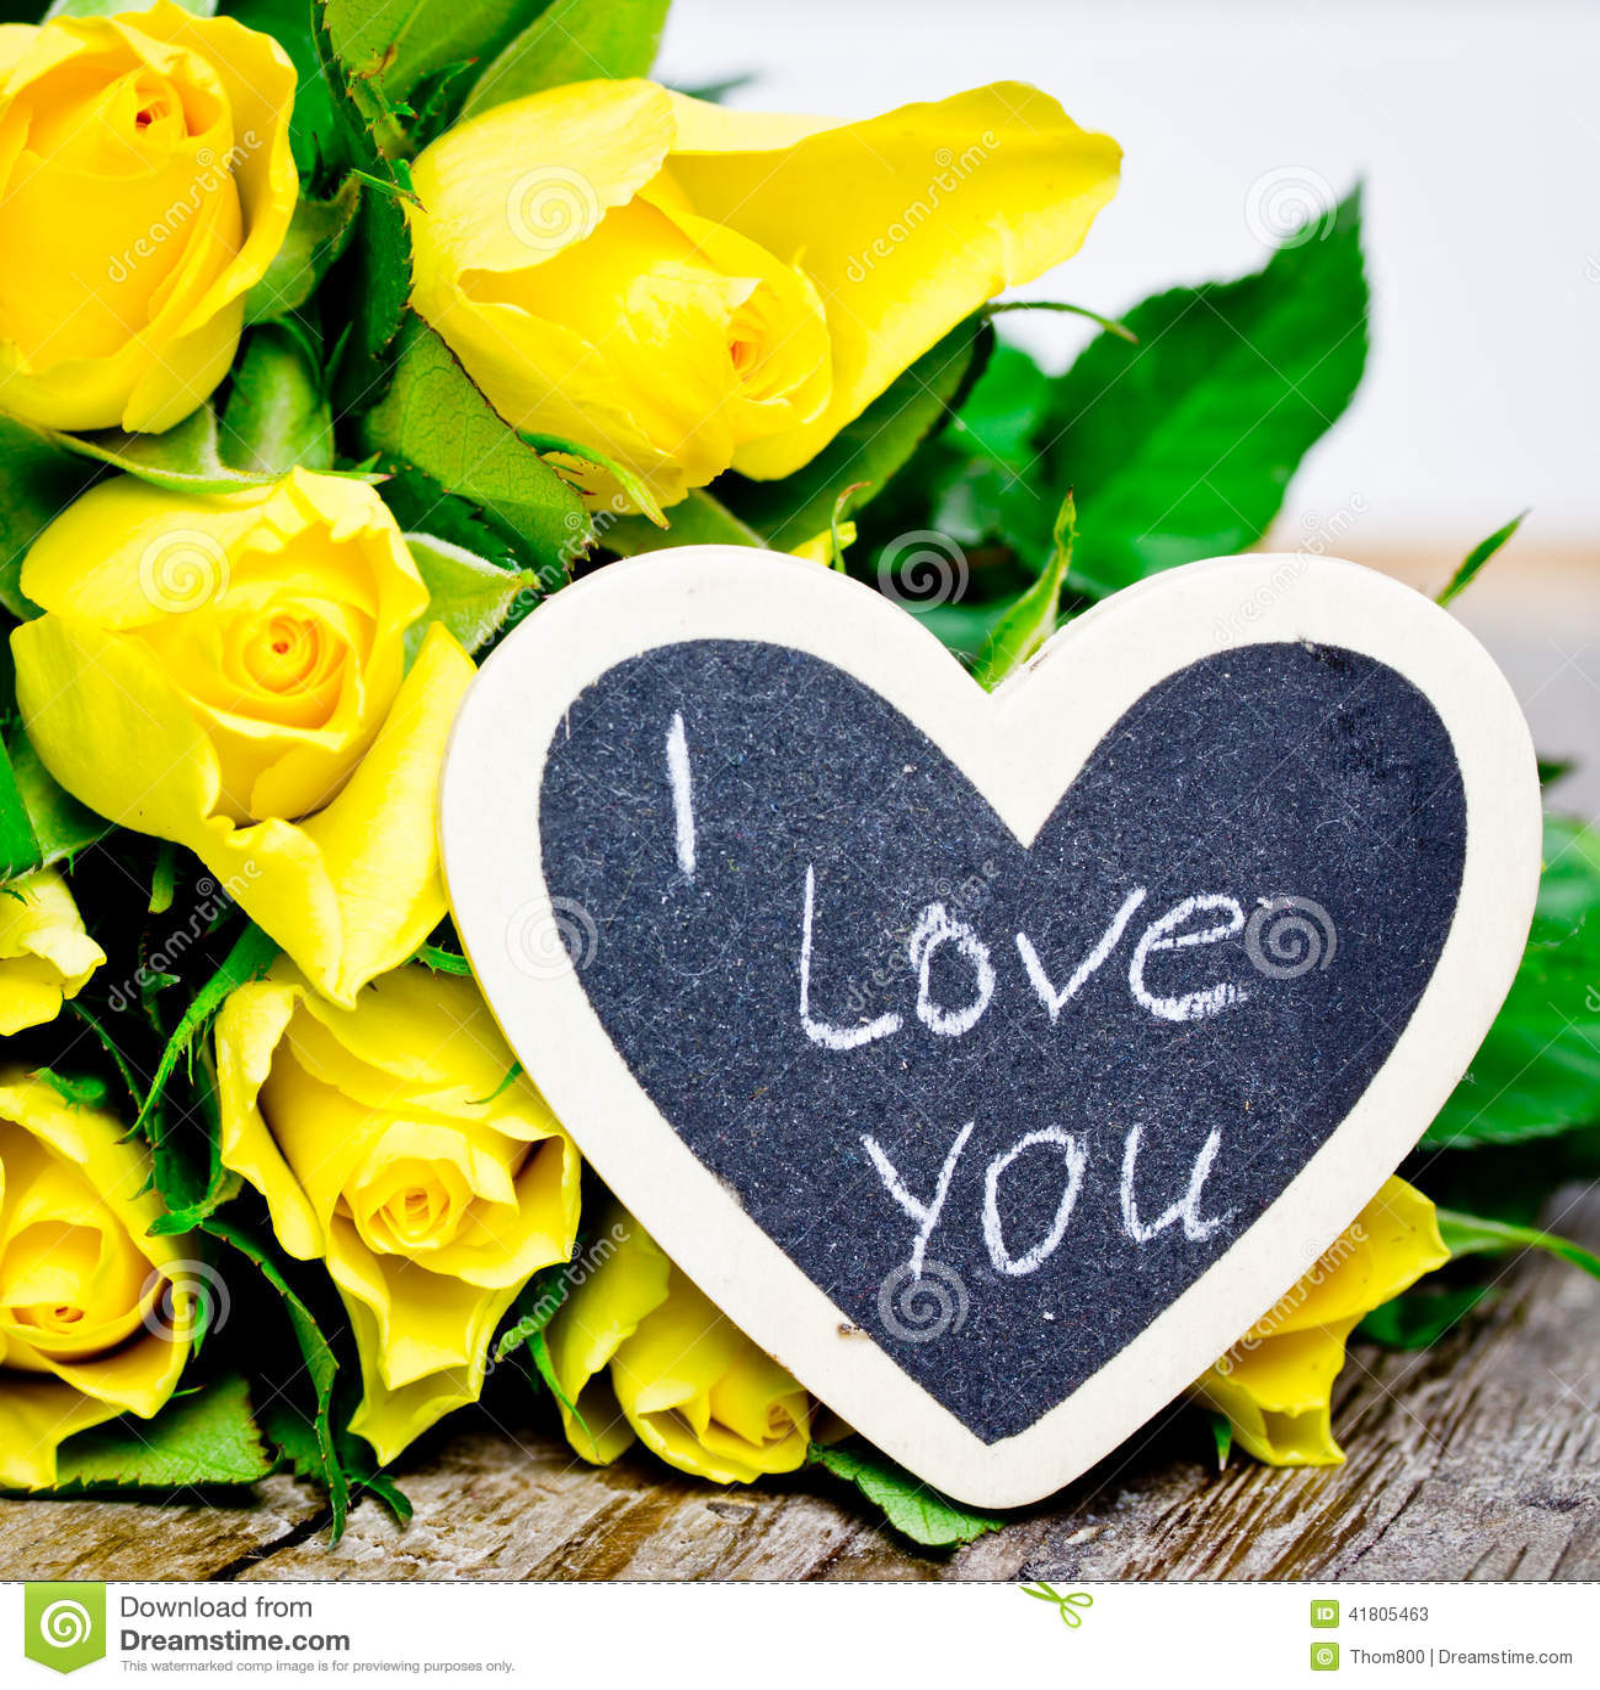 Yellow Roses Stock Photo - Image: 41805463